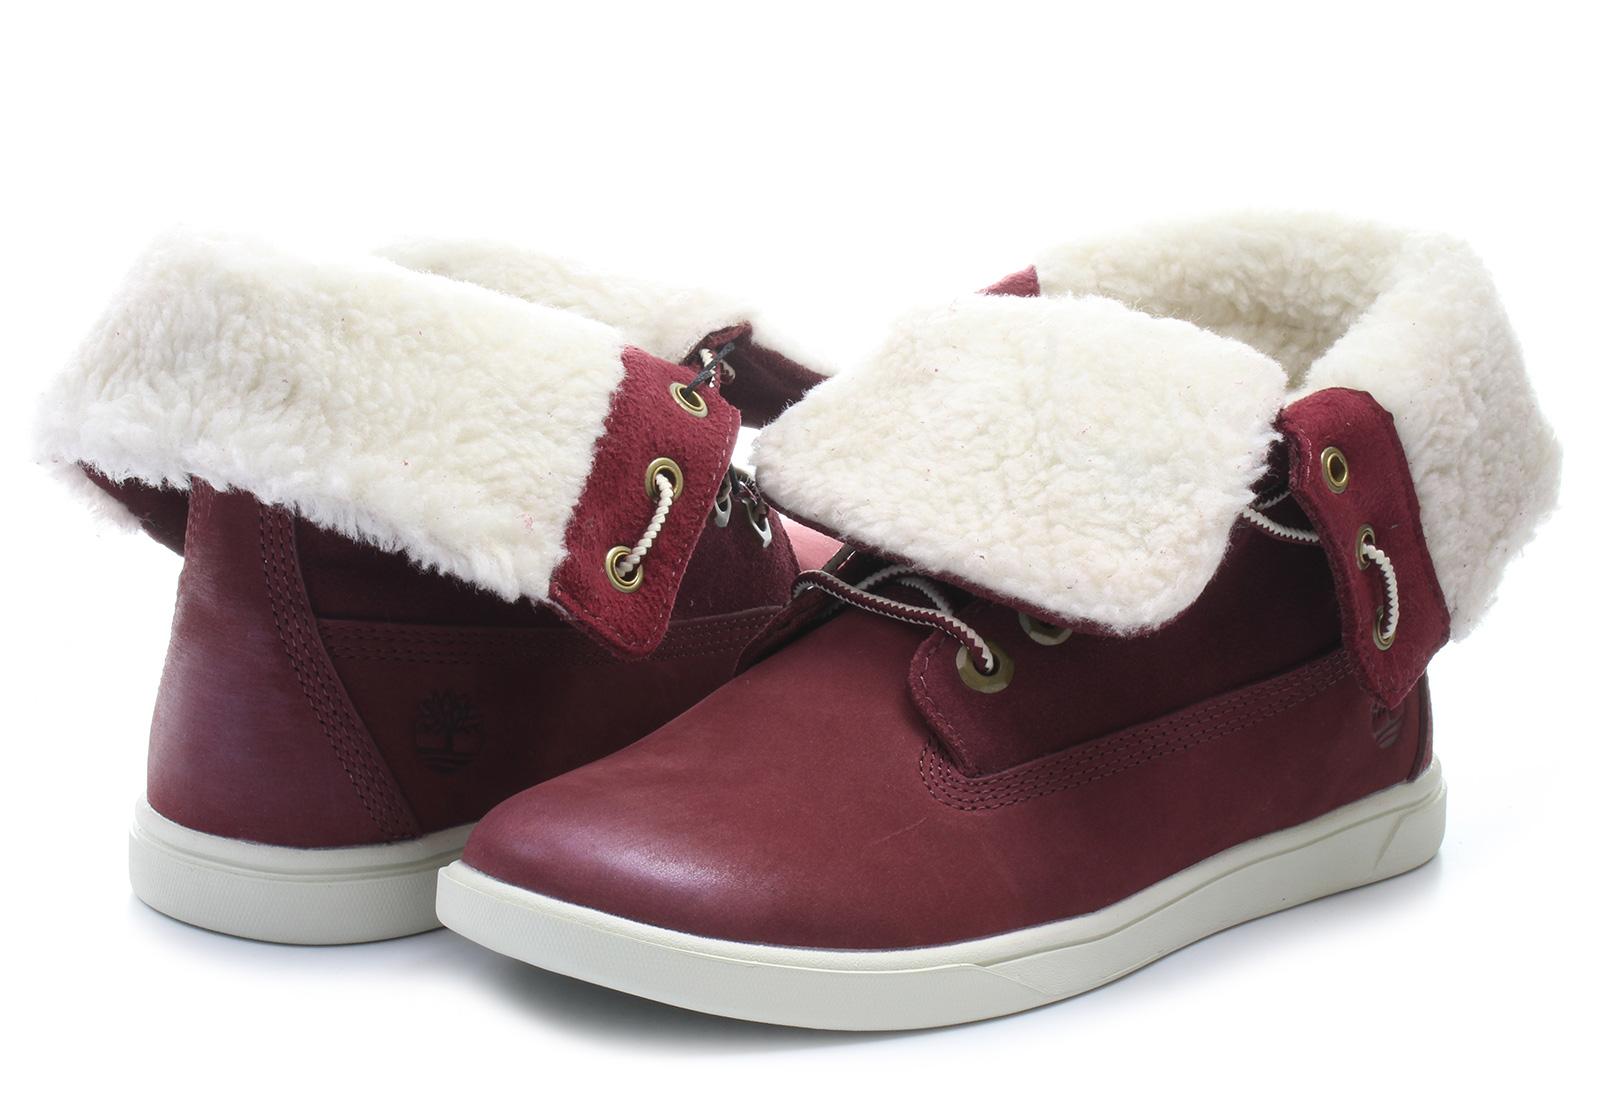 1f96da5658c5 Timberland Boots - Groveton Girls Deering Fold Down - a164n-bur ...